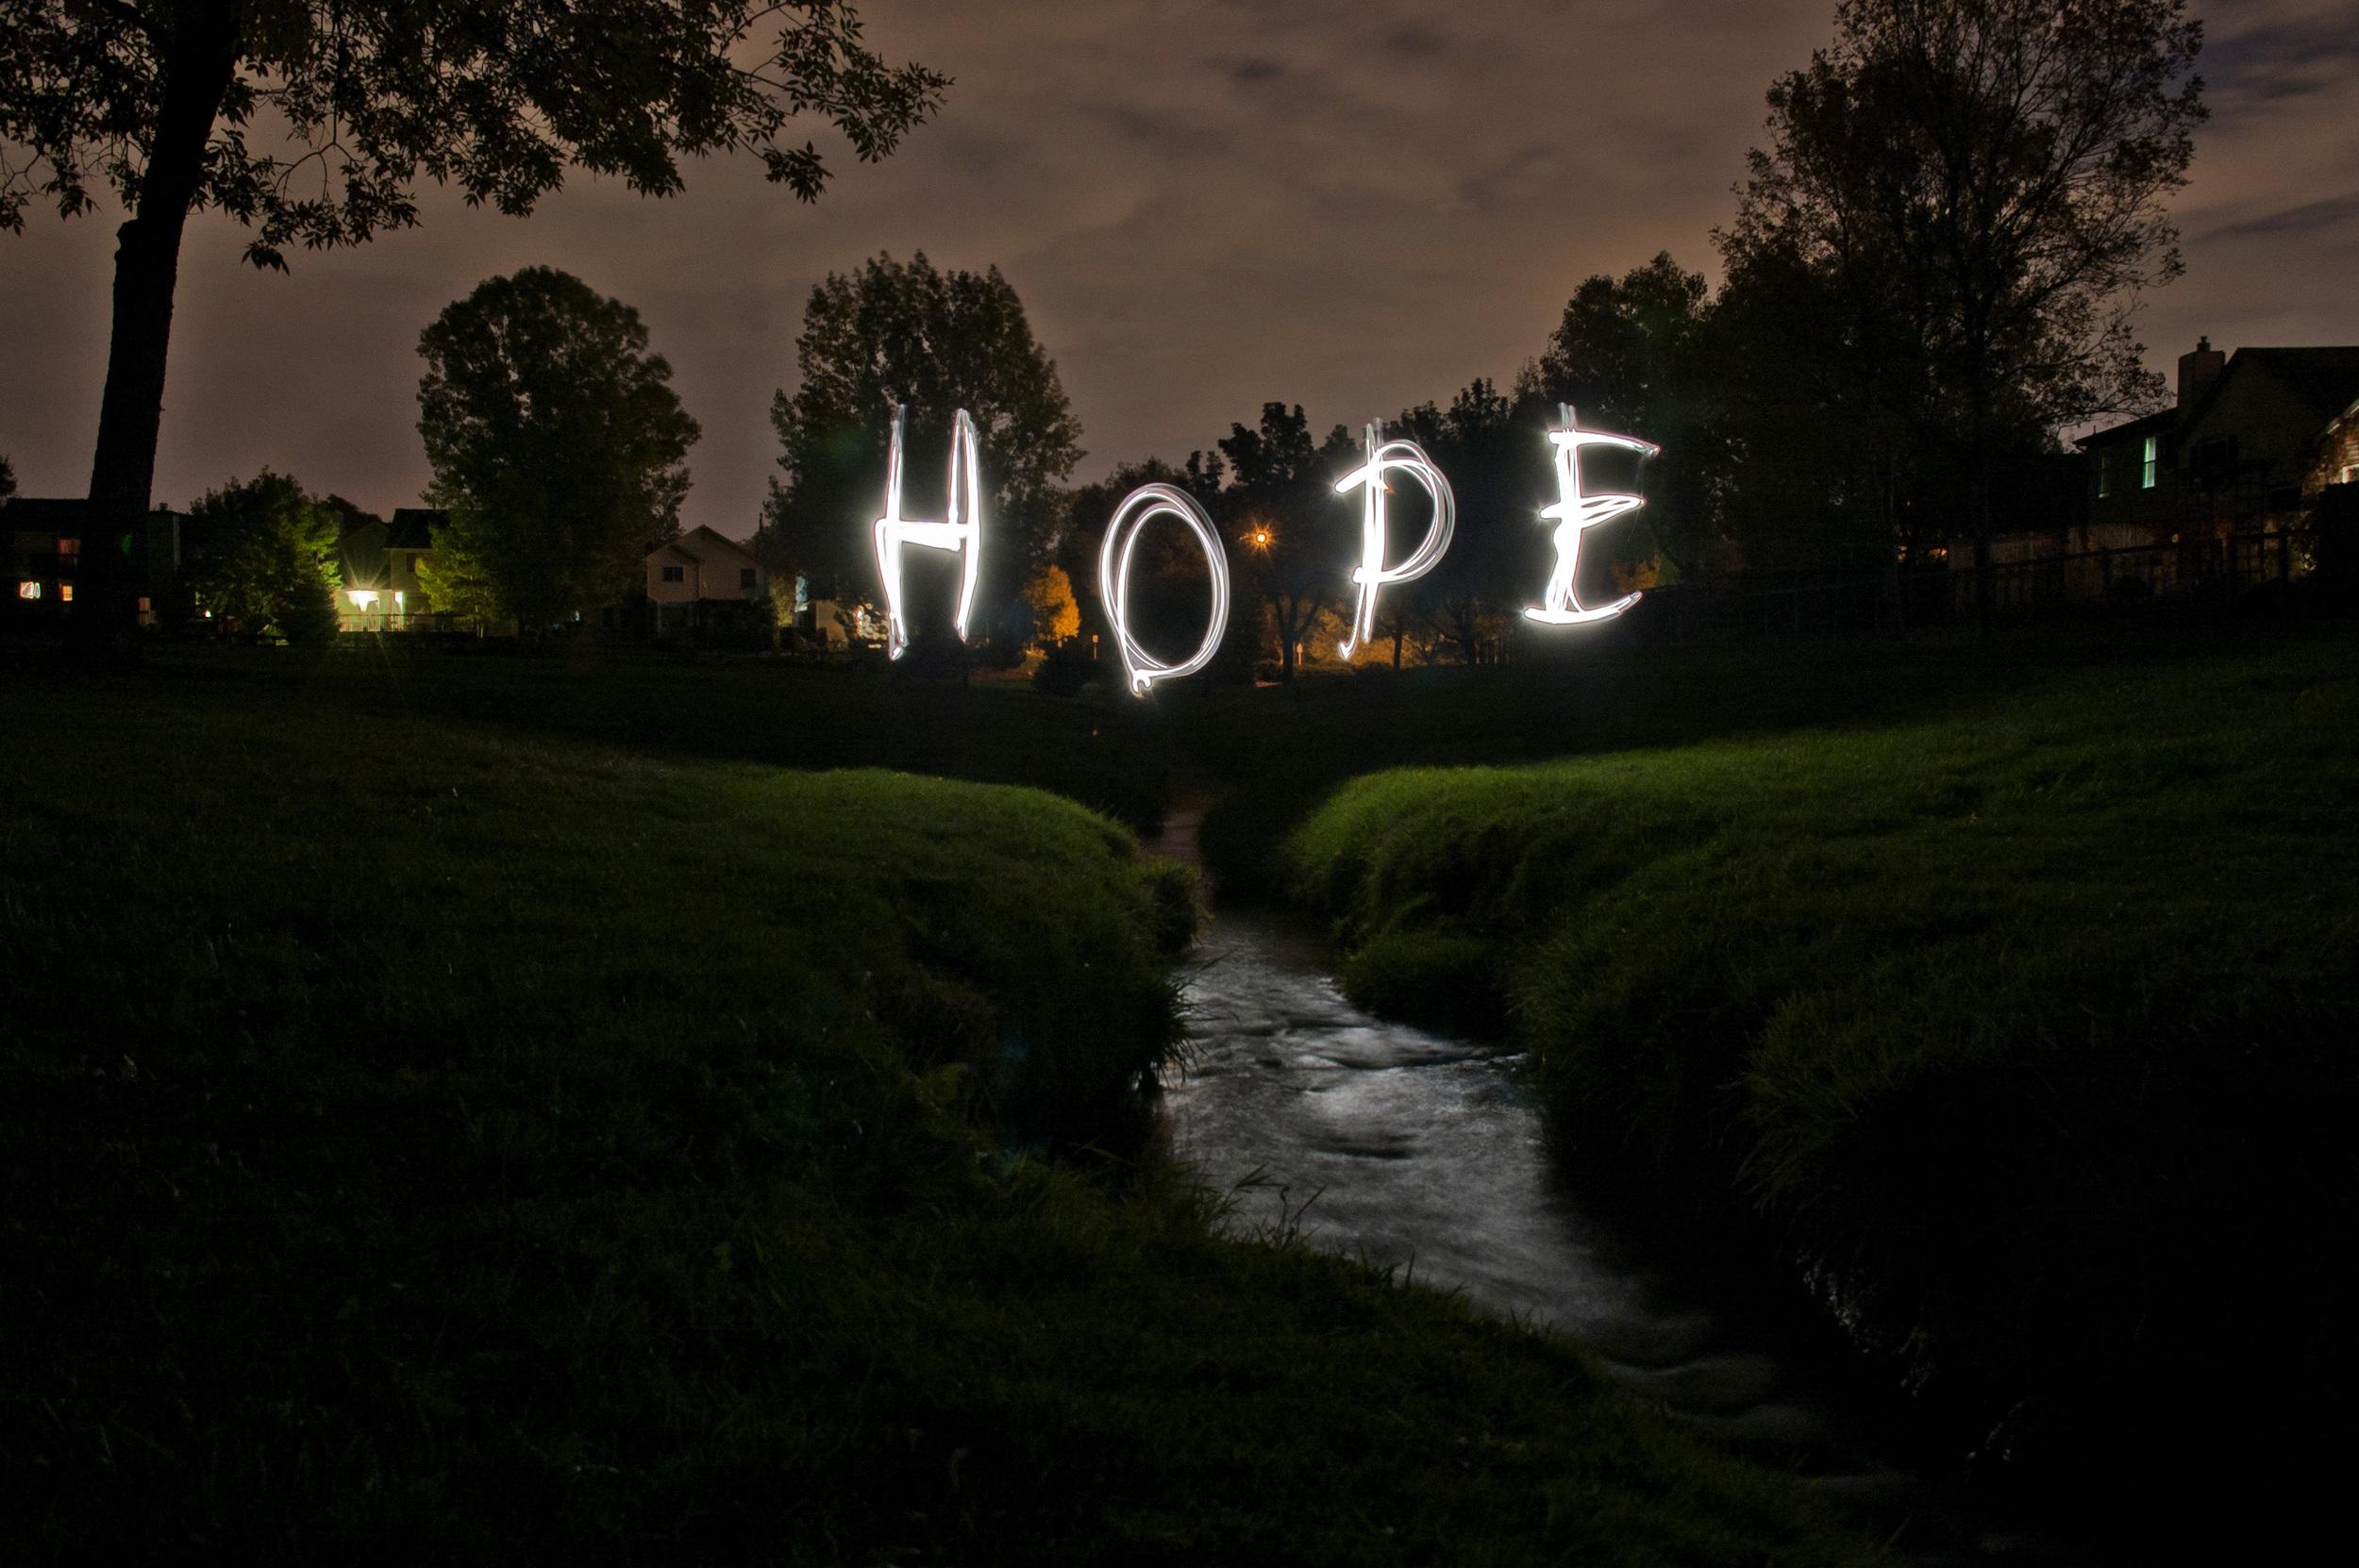 12 Hope016.jpg